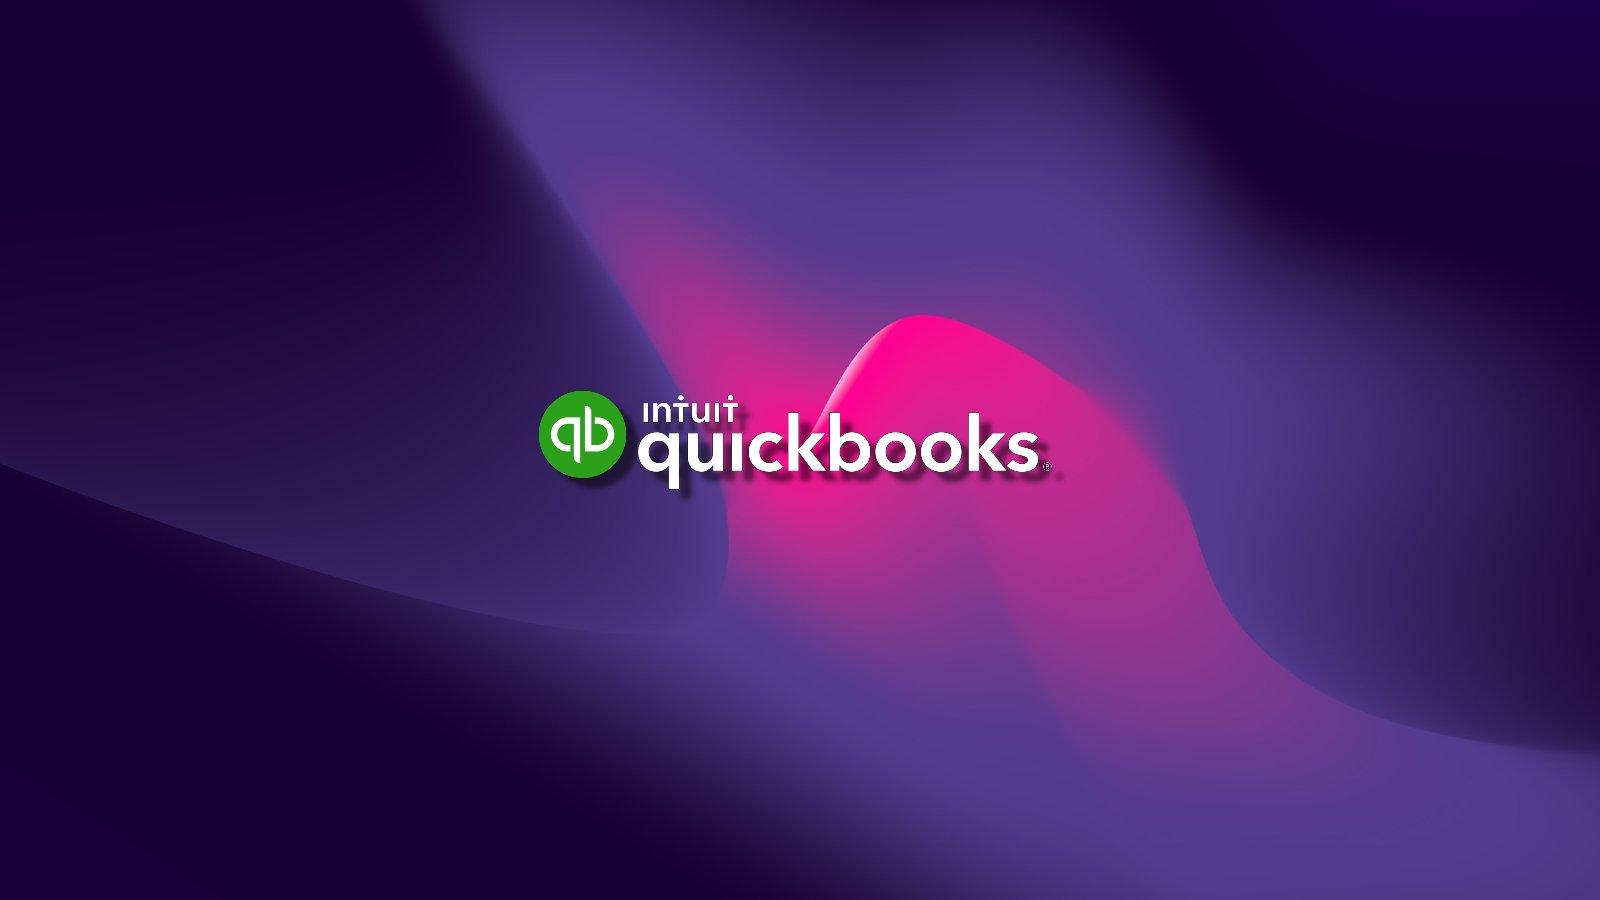 Intuit warns QuickBooks customers of ongoing phishing attacks